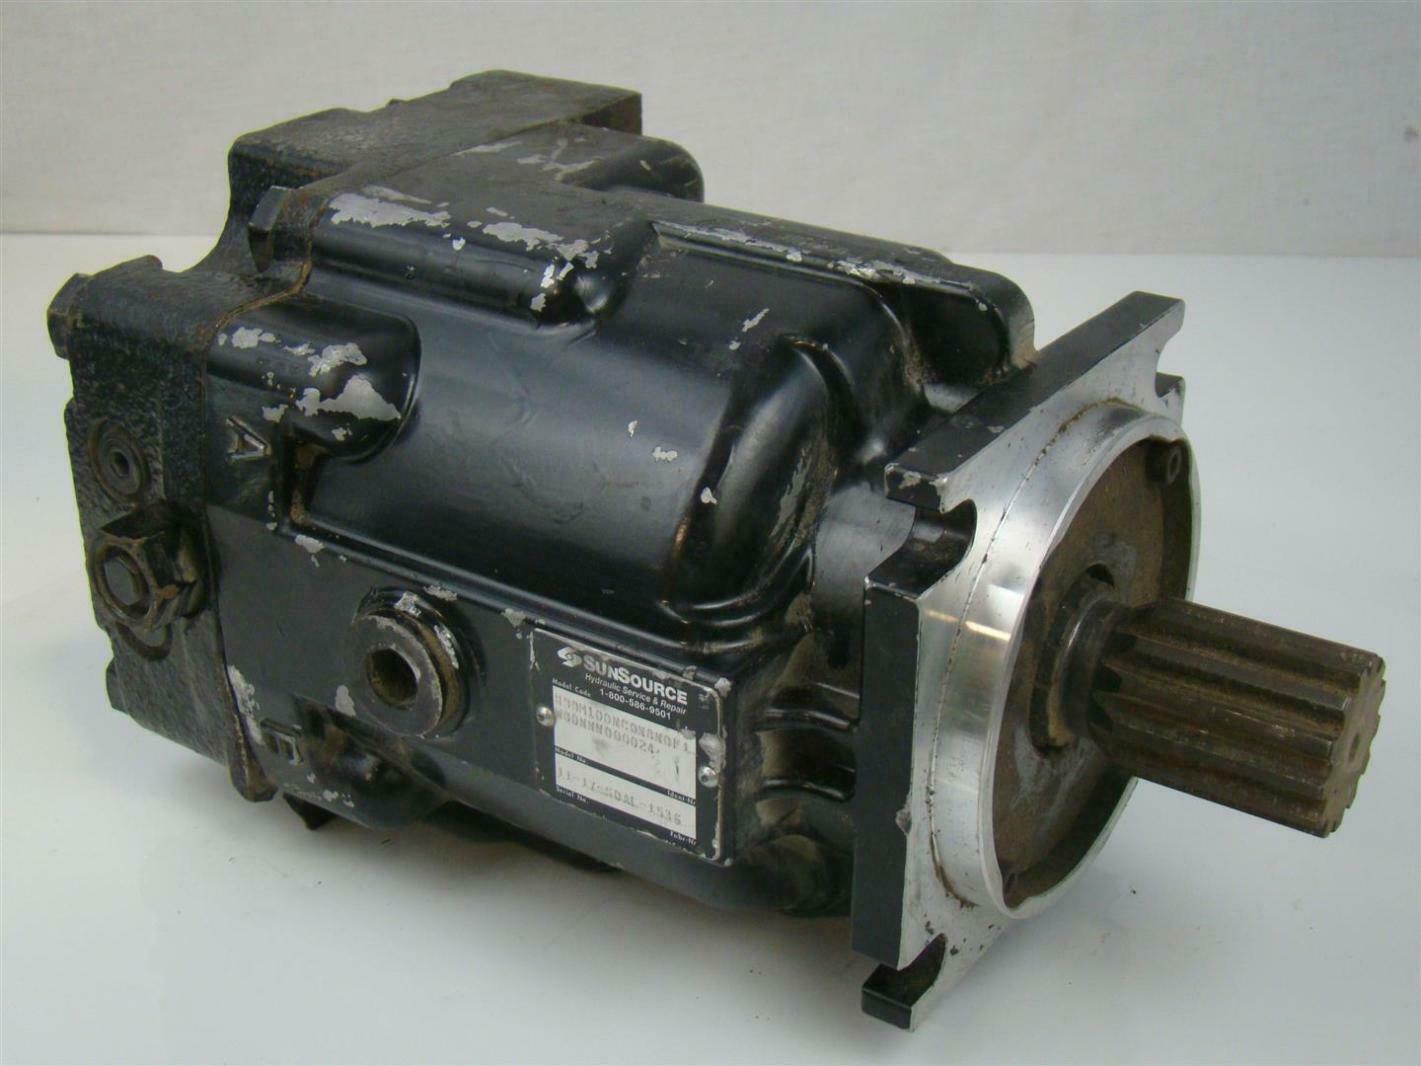 Sauer Danfoss Axial Refurbished Piston Hydraulic Motor 1